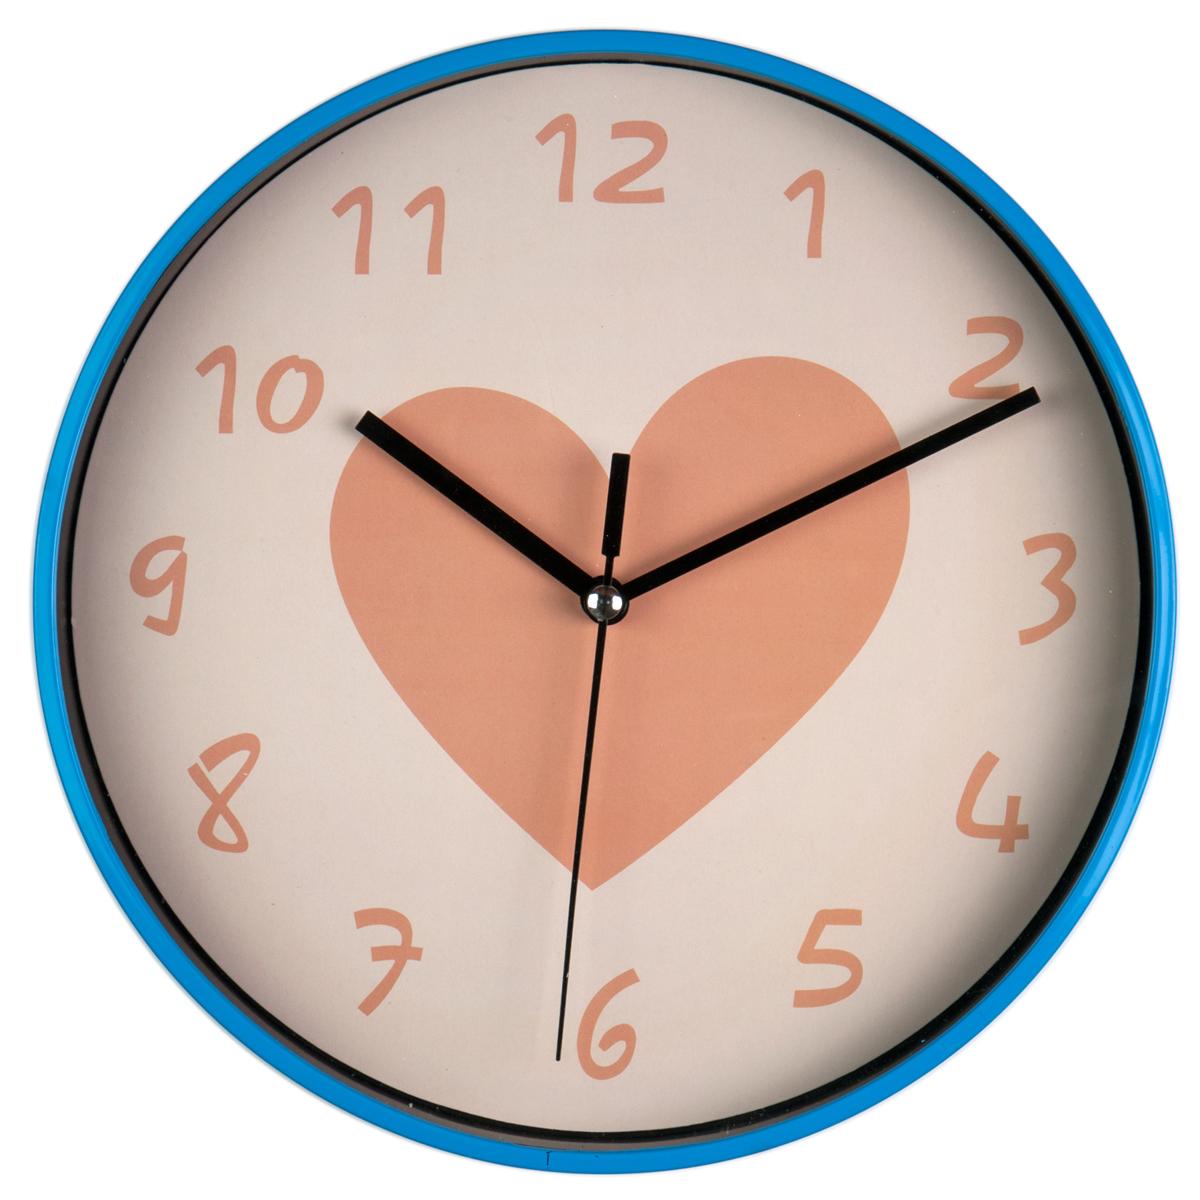 Часы настенные Miralight, 20 x 20 см. MC-4720 meinl mc pts 12 x 12